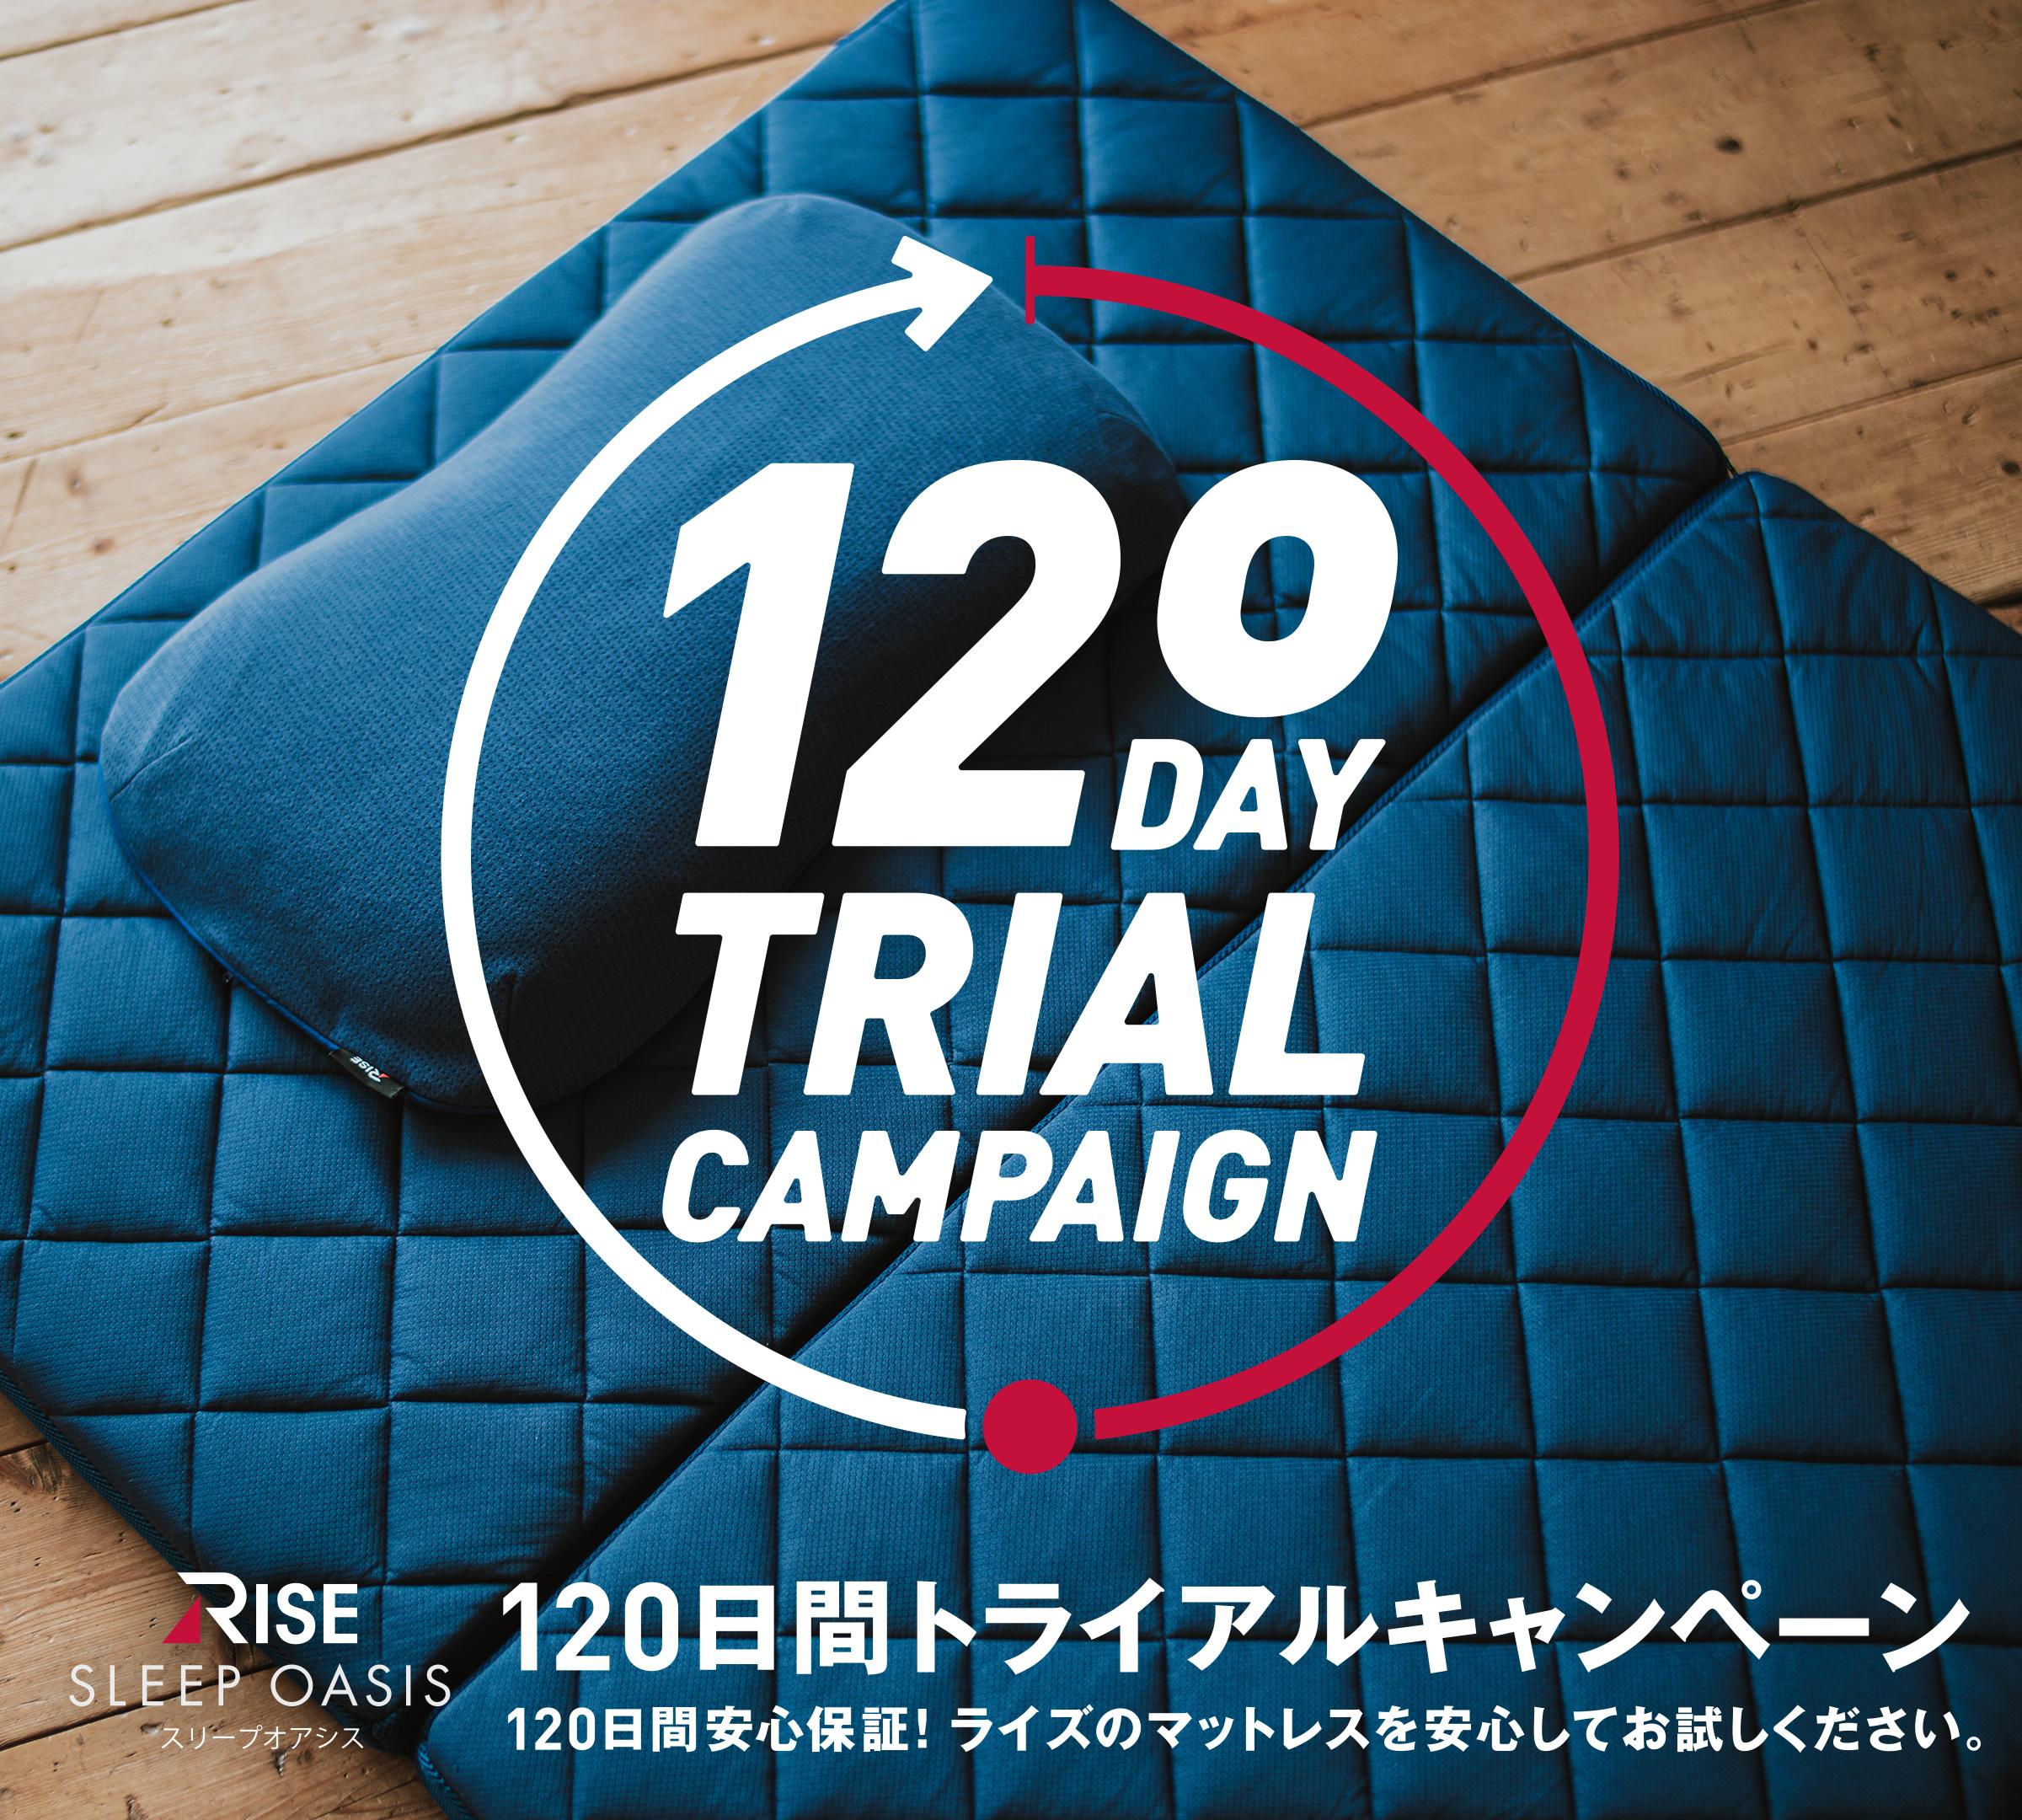 RISE SLEEP OASIS スリーブアオシス 120日間トライアルキャンペーン